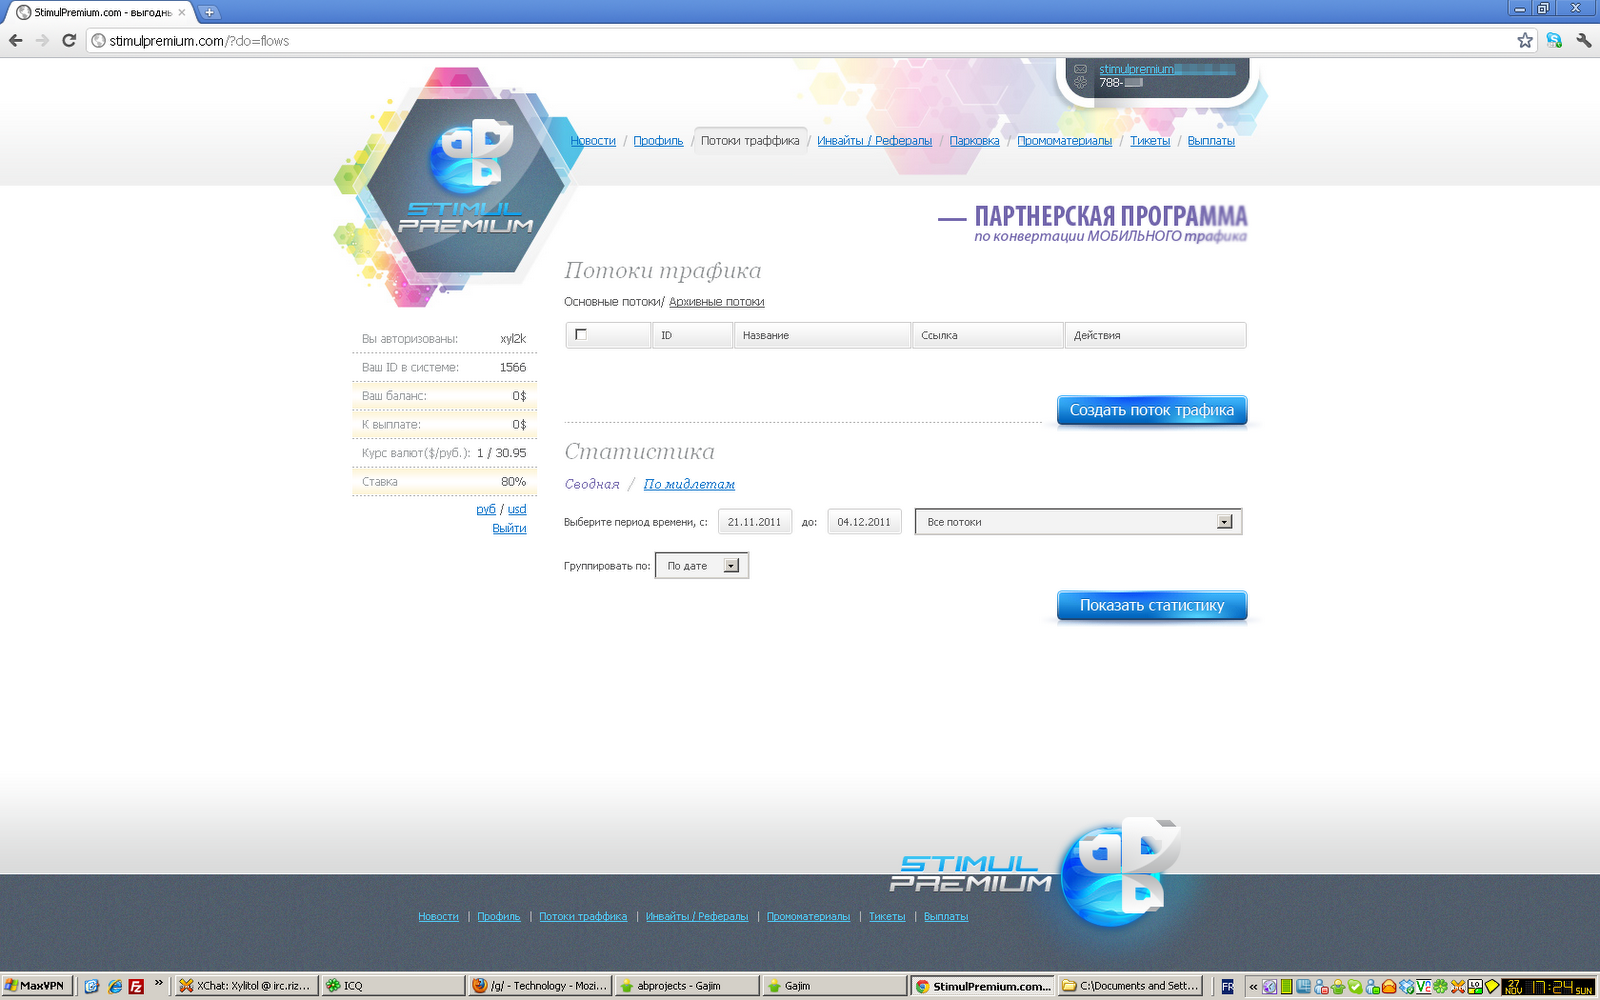 XyliBox: Stimul Premium (Java.SMSSend)